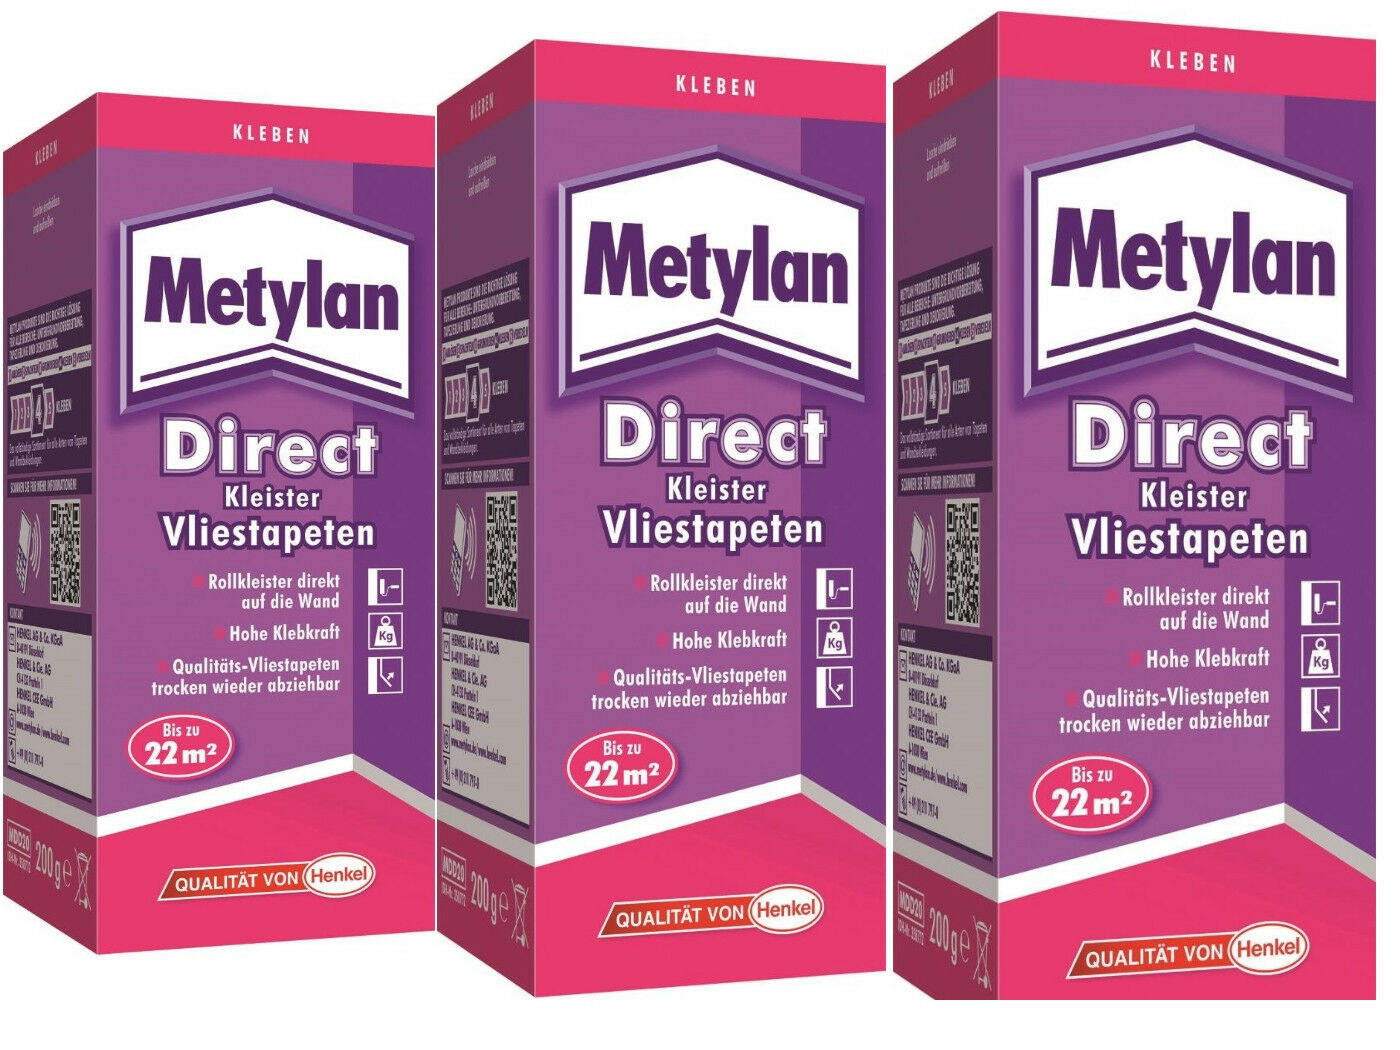 metylan direct kleister vliestapeten 3x200g | ebay